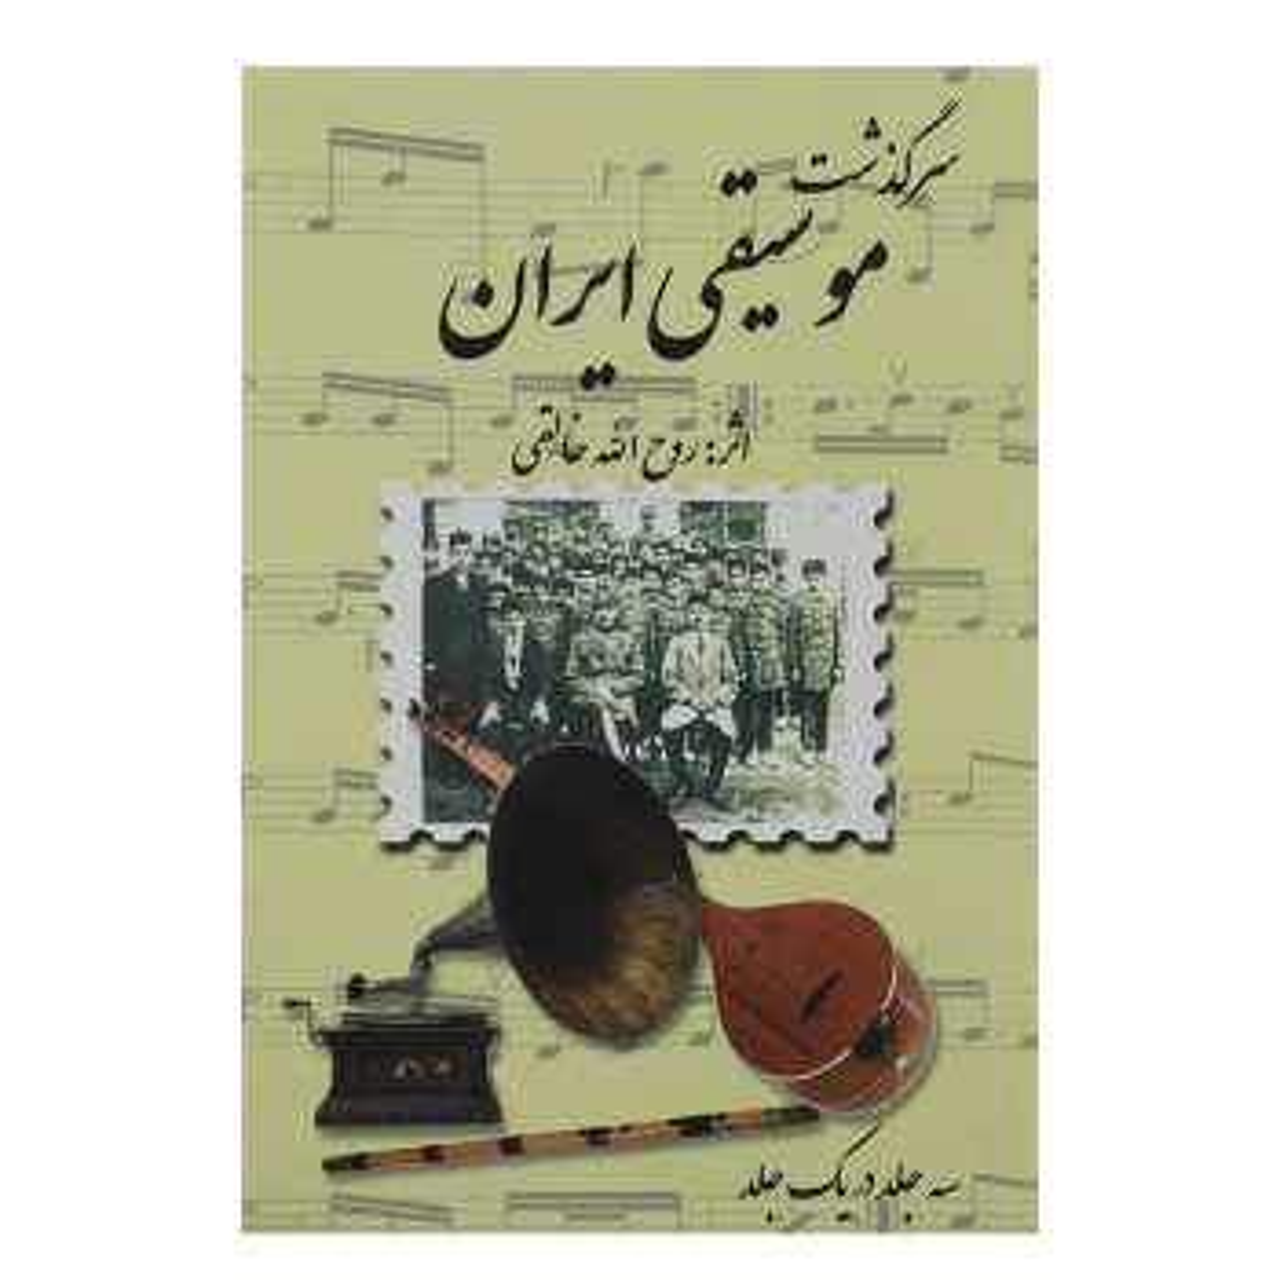 کتاب سرگذشت موسیقی ایران اثر روح الله خالقی